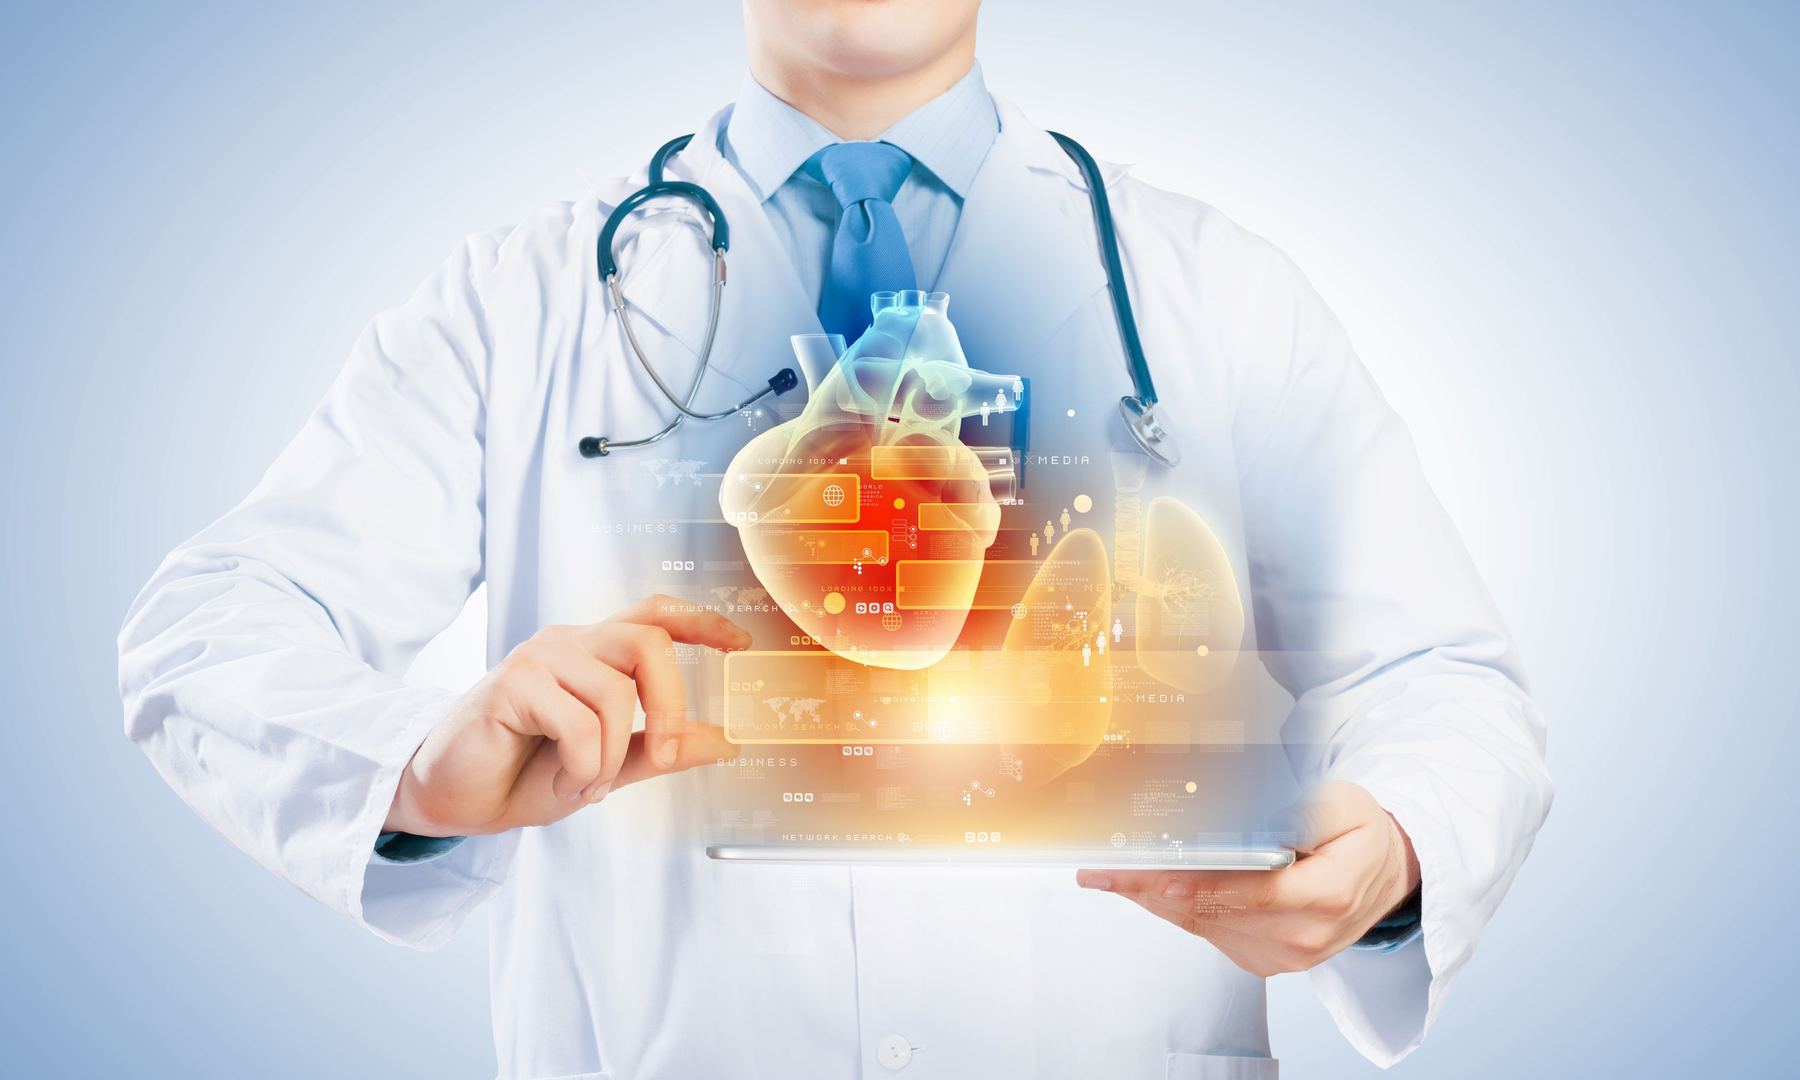 sergant hipertenzija, pulsas yra įtemptas vaistas gydo hipertenziją